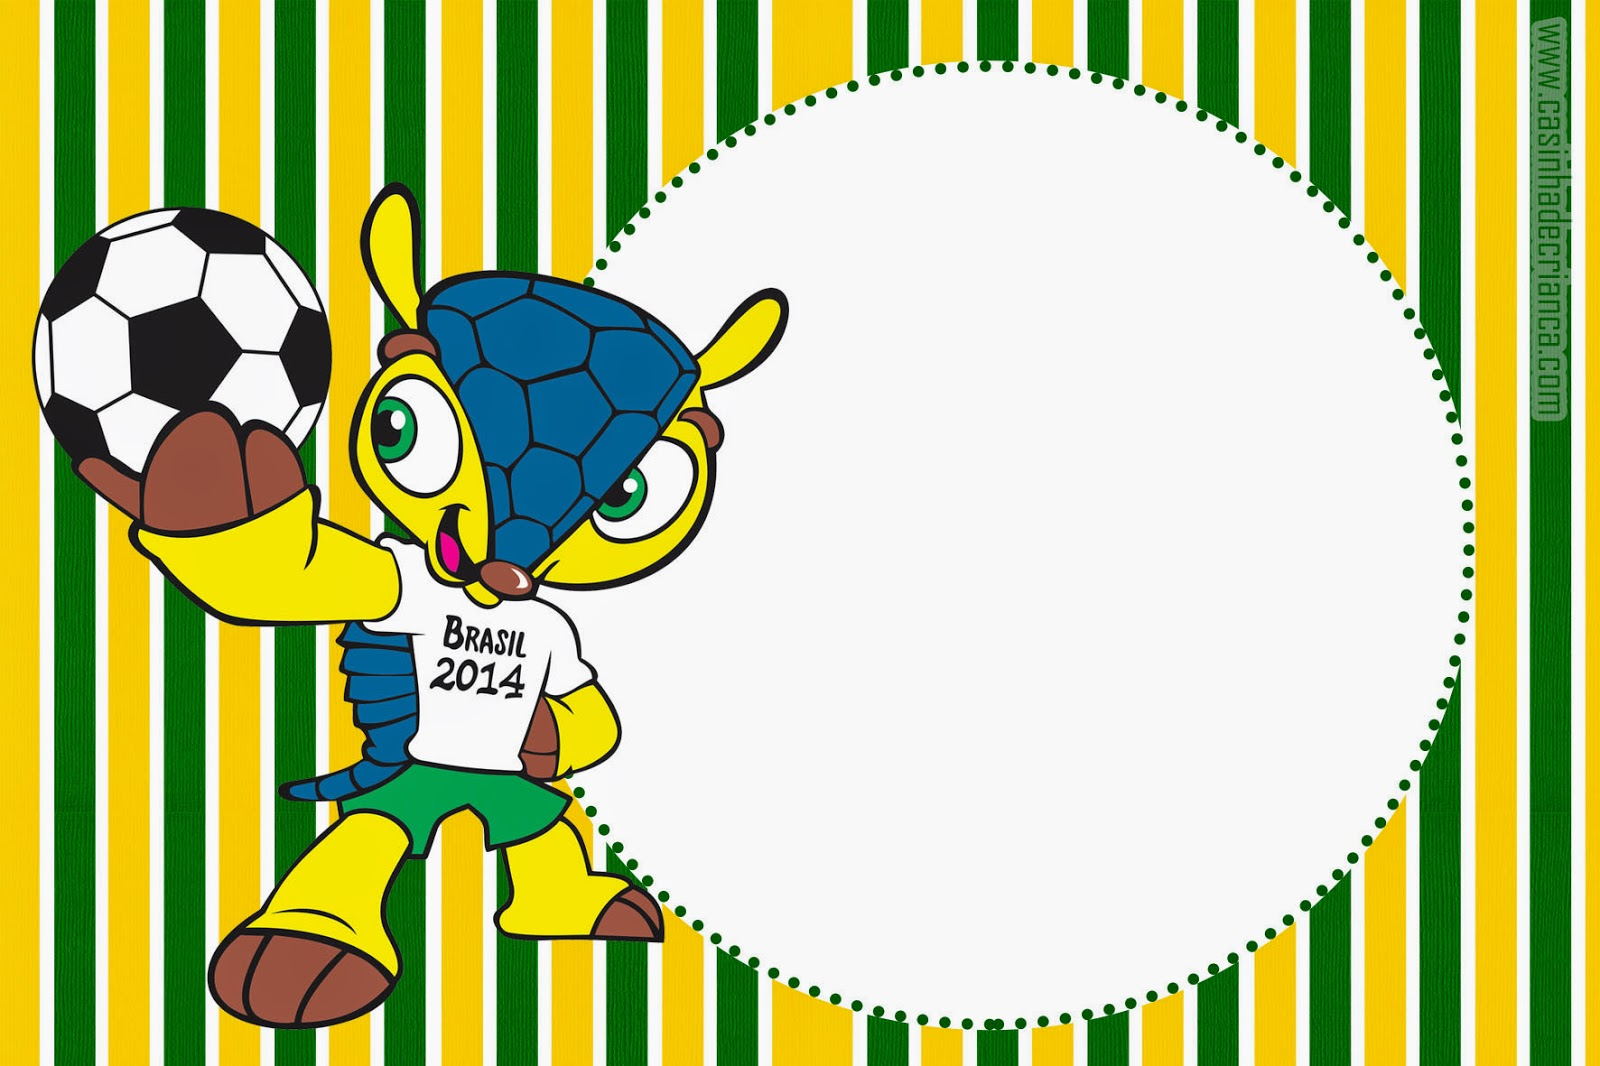 convite Copa 2014 Para Imprimir Grátis